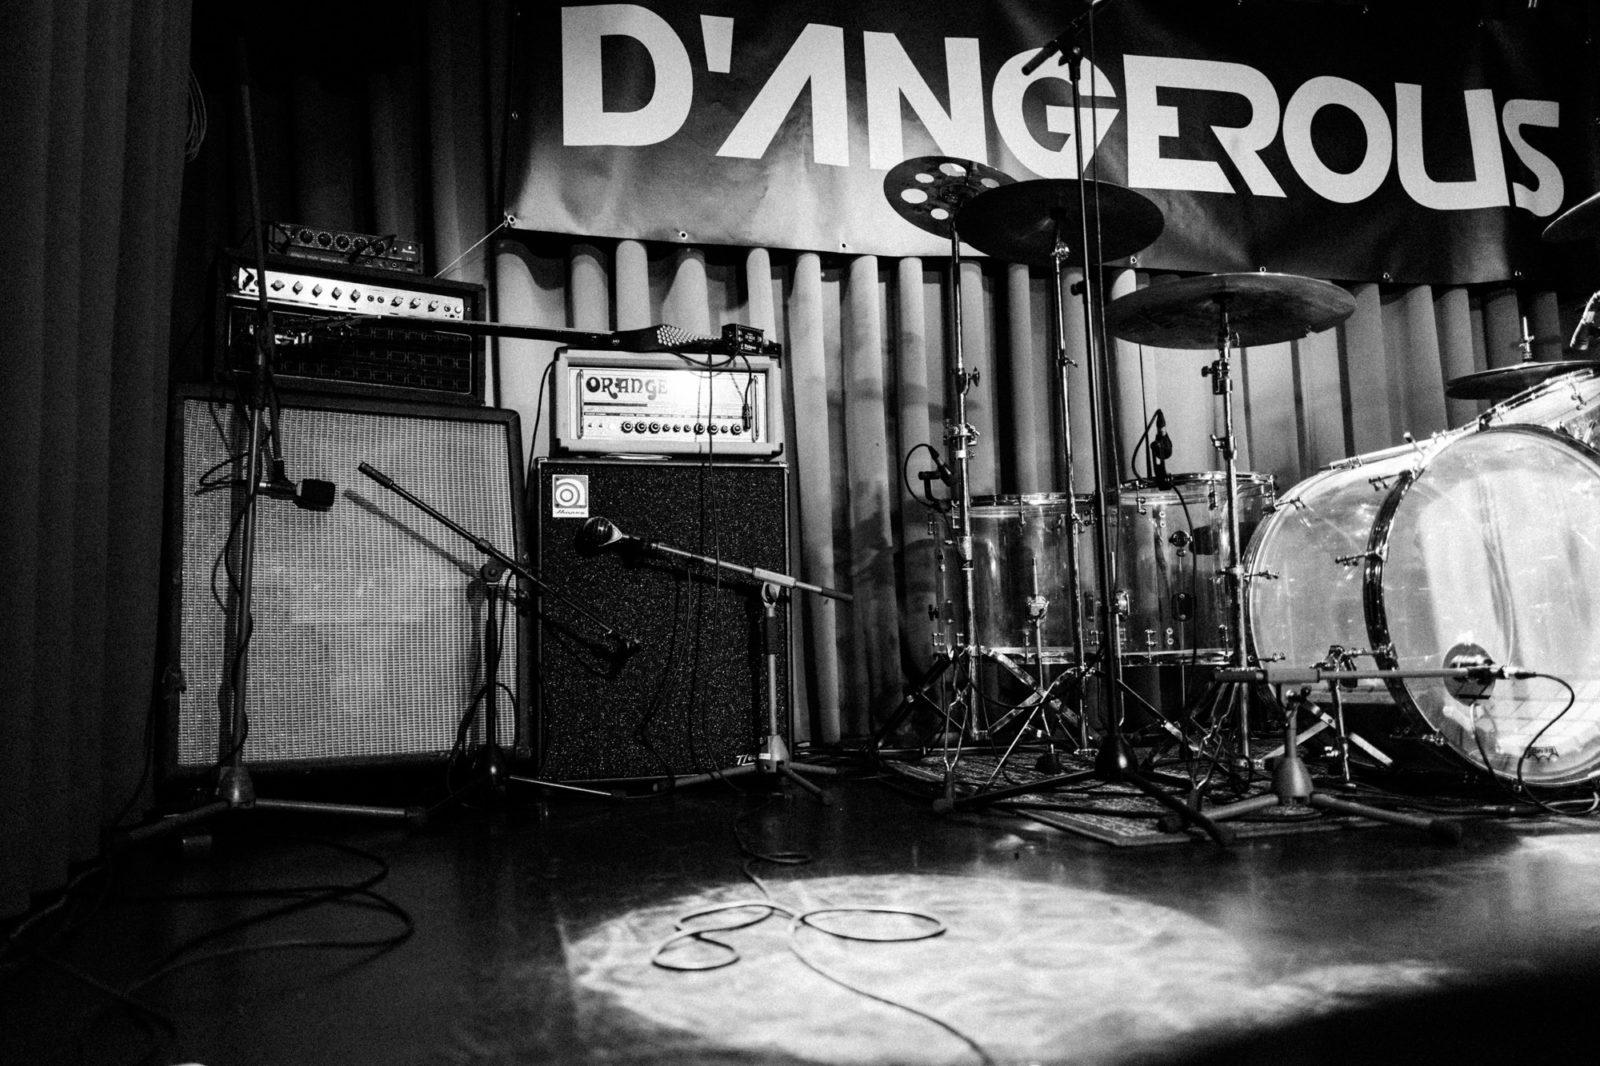 Dangerous-1190856